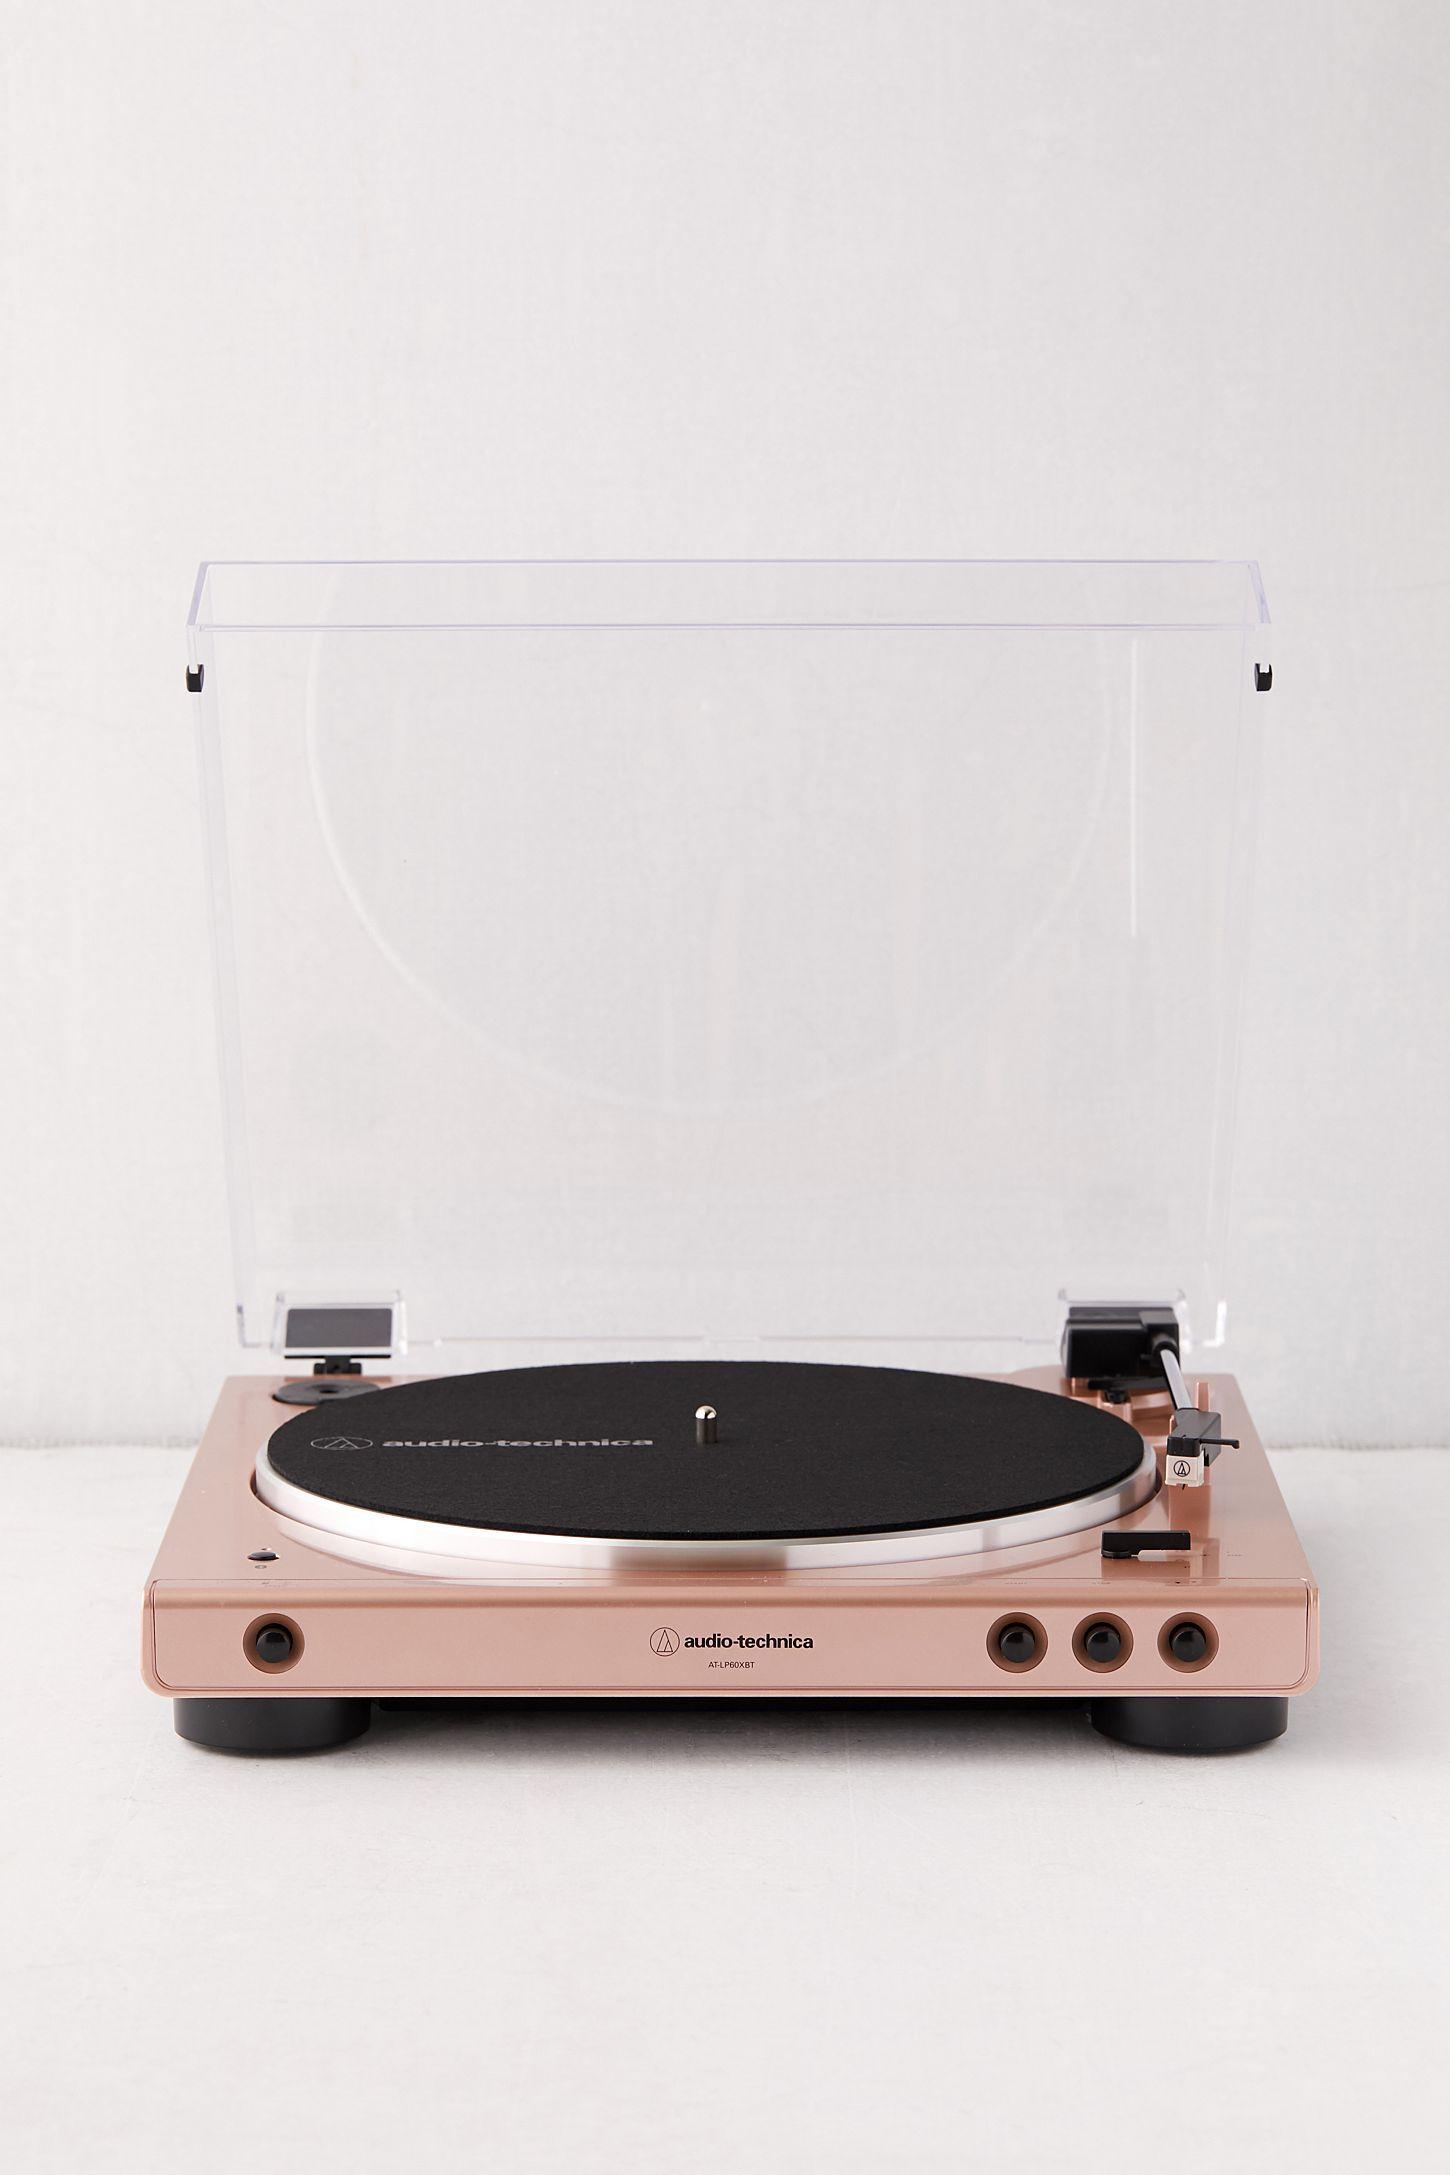 Audio Technica Uo Exclusive Lp60x Bt Bluetooth Record Player Bluetooth Record Player Record Player Audio Technica